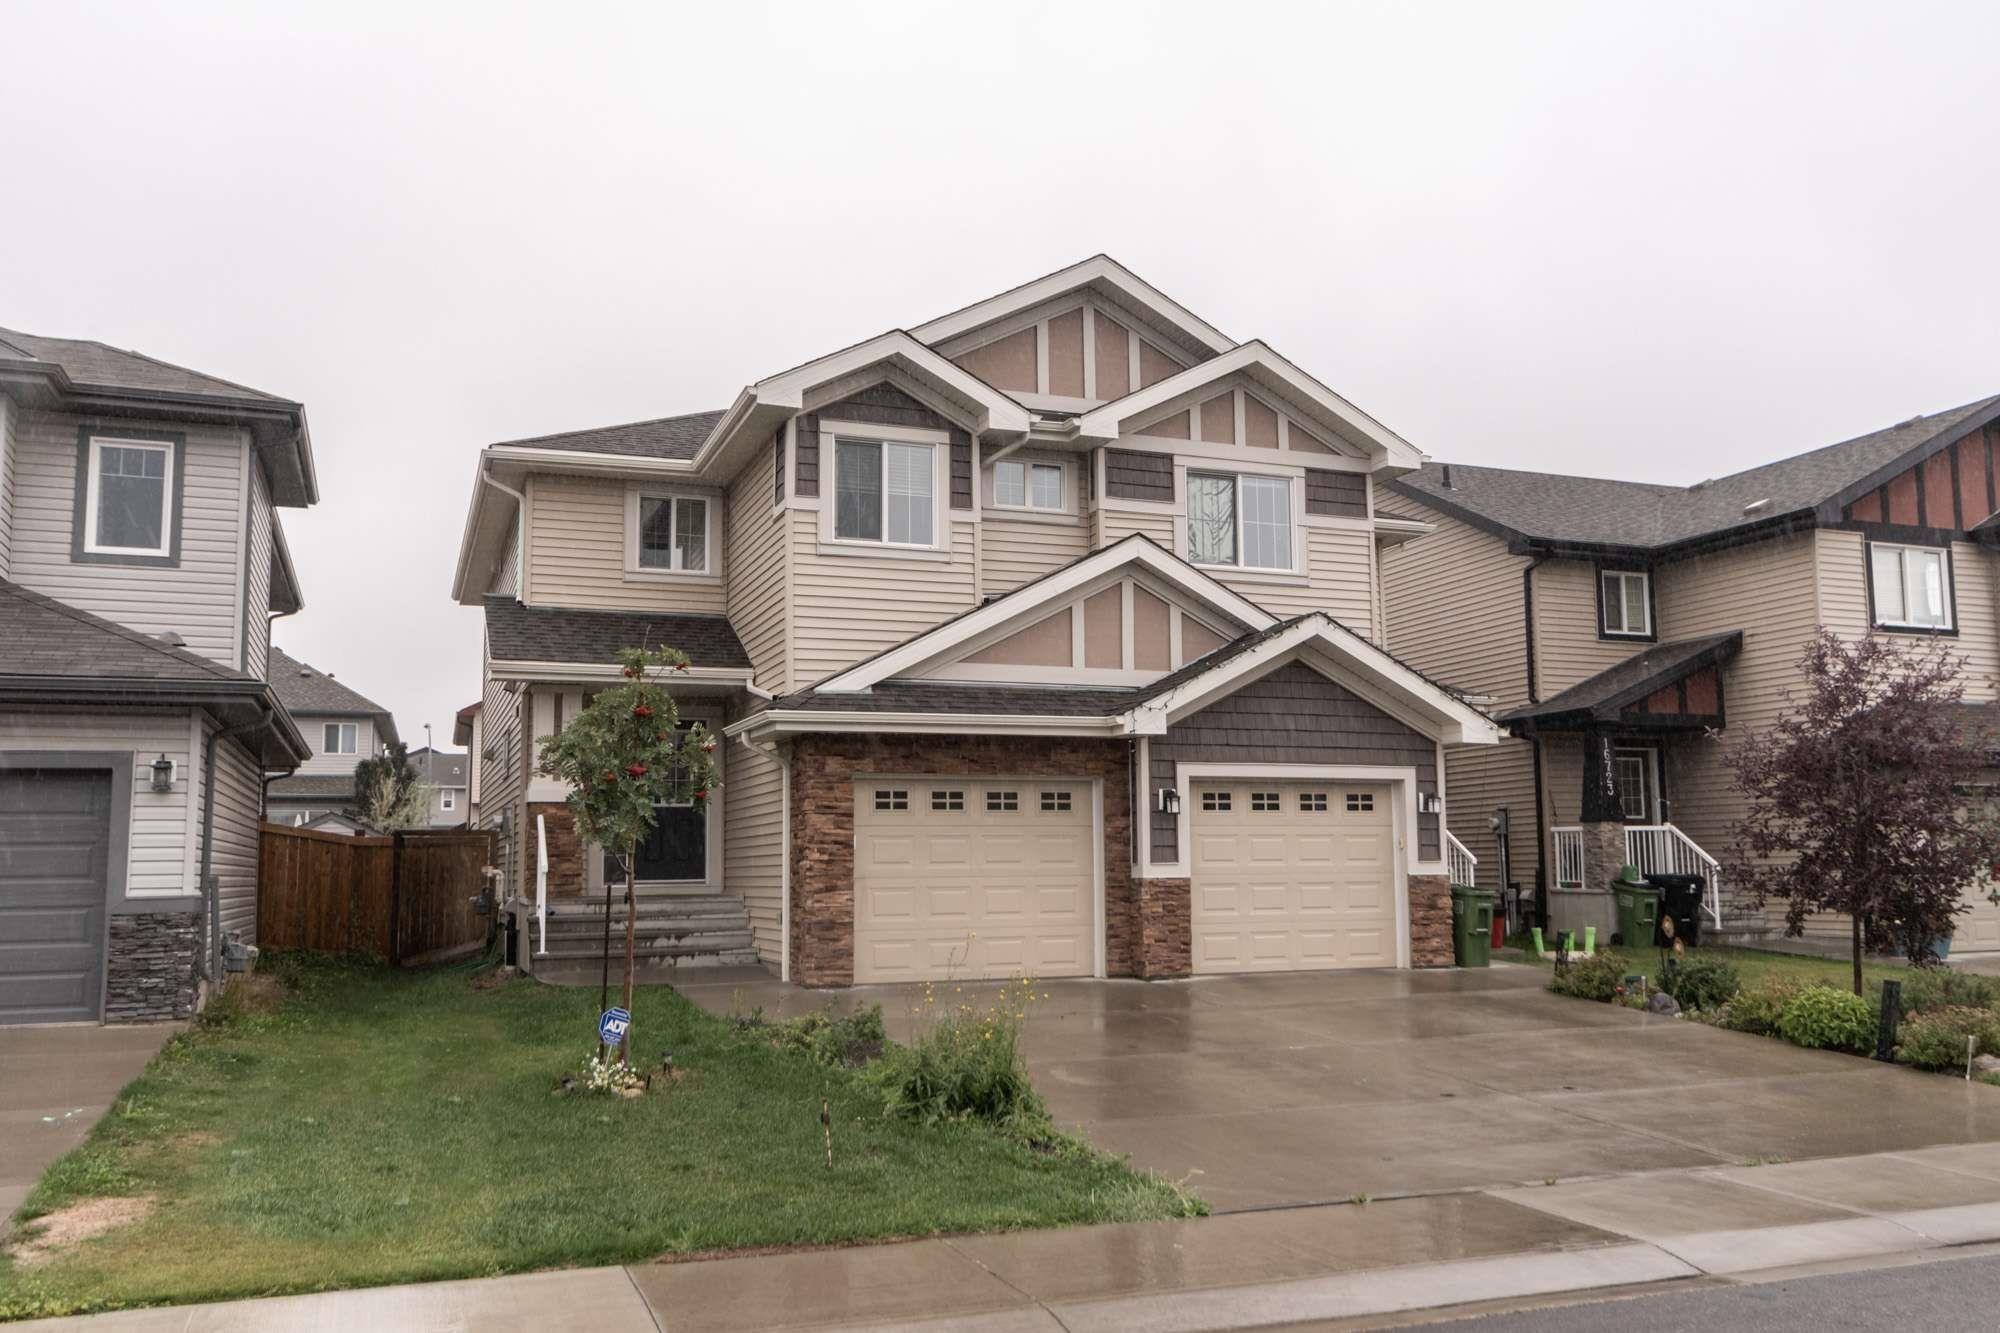 Main Photo: 16727 120 Street in Edmonton: Zone 27 House Half Duplex for sale : MLS®# E4259975